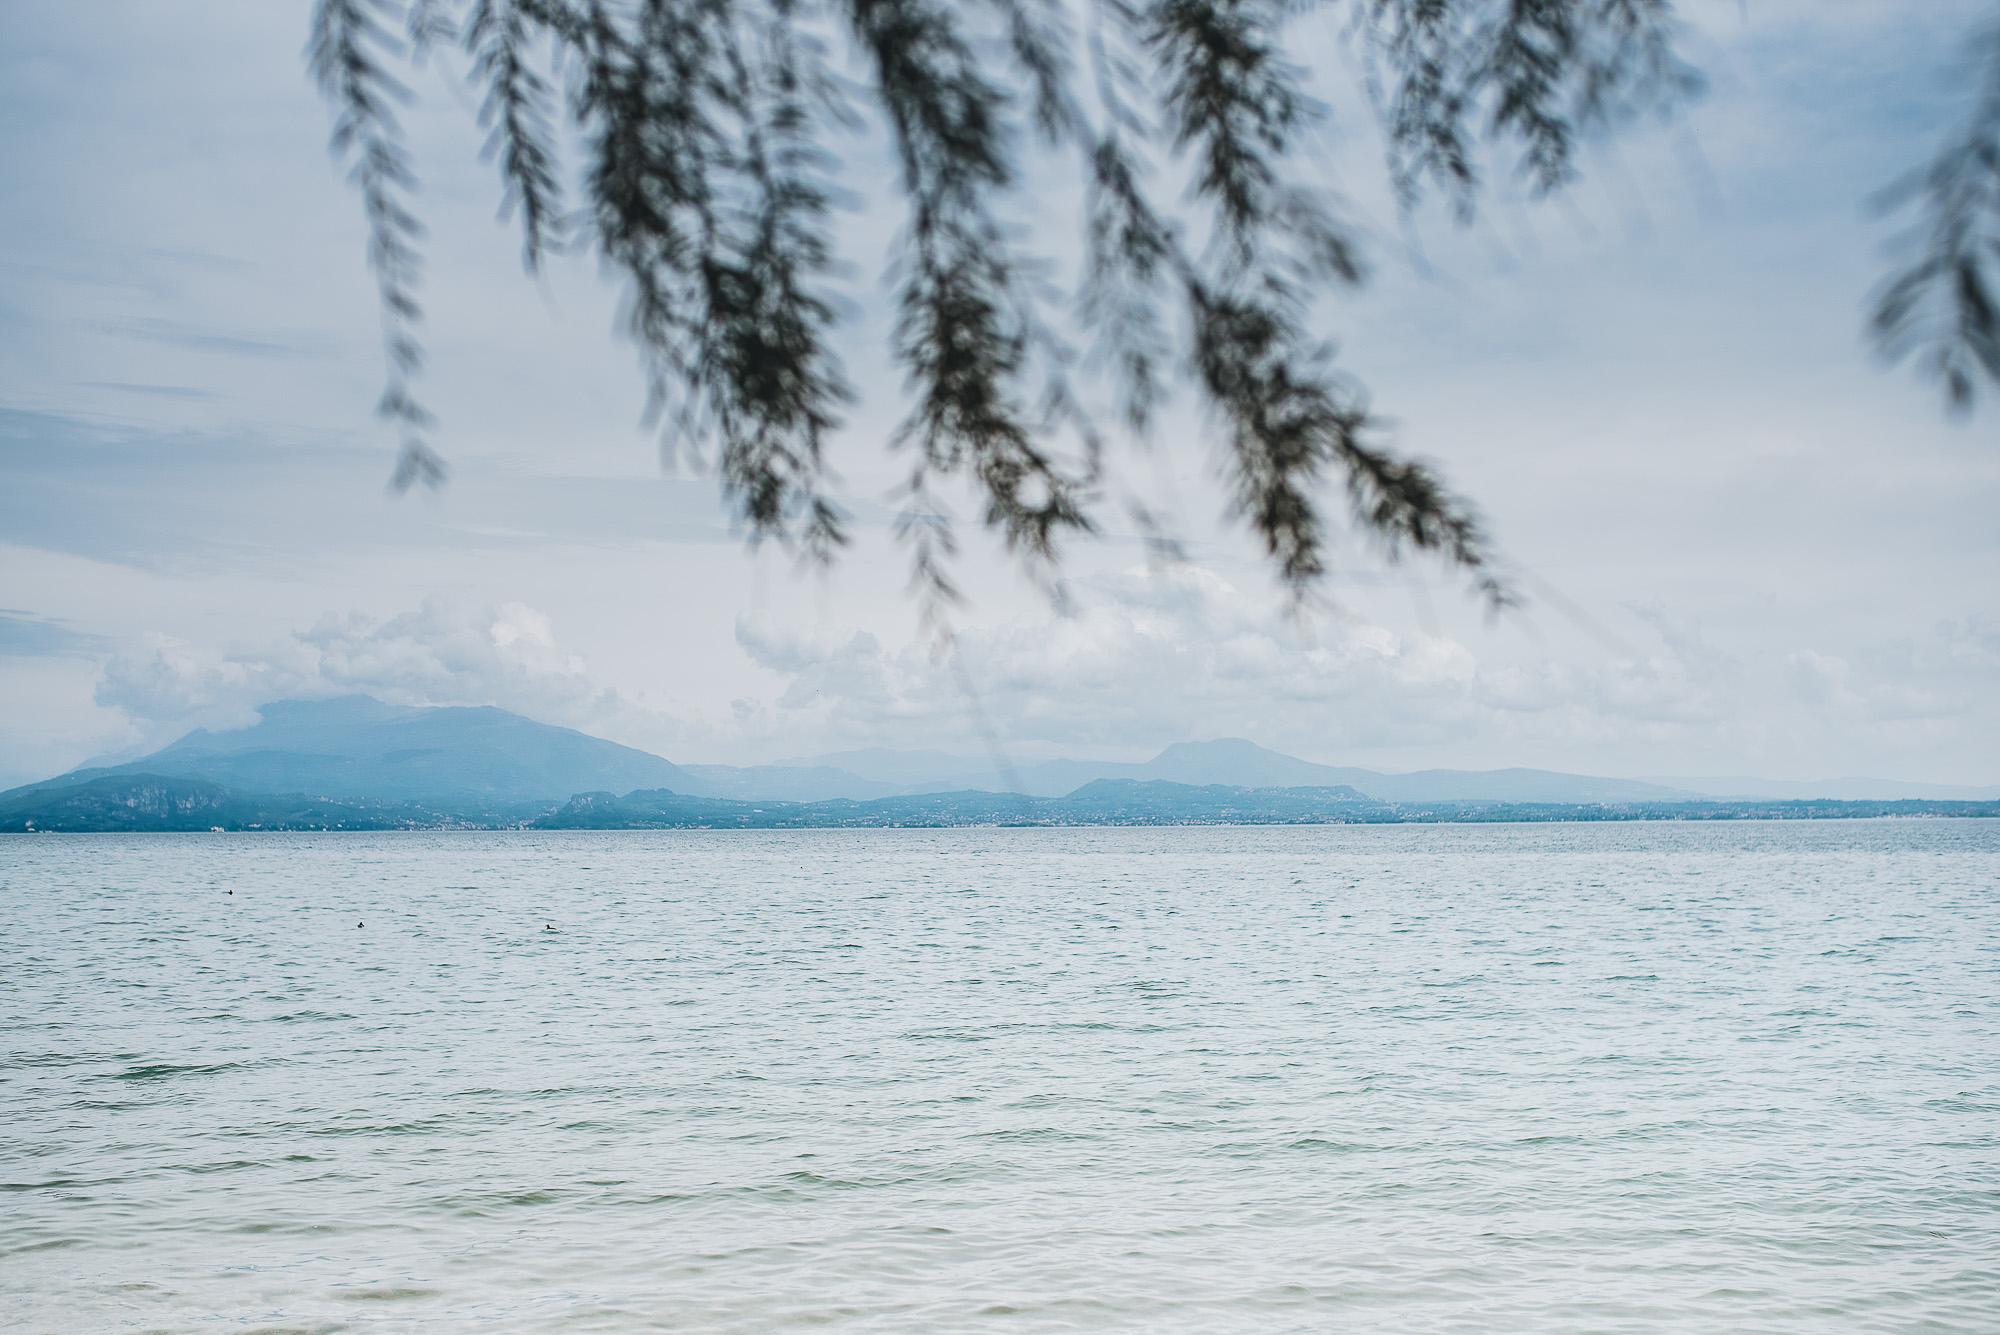 OurBeautifulAdventure-LakeGarda-Italy-Blog-0802.jpg